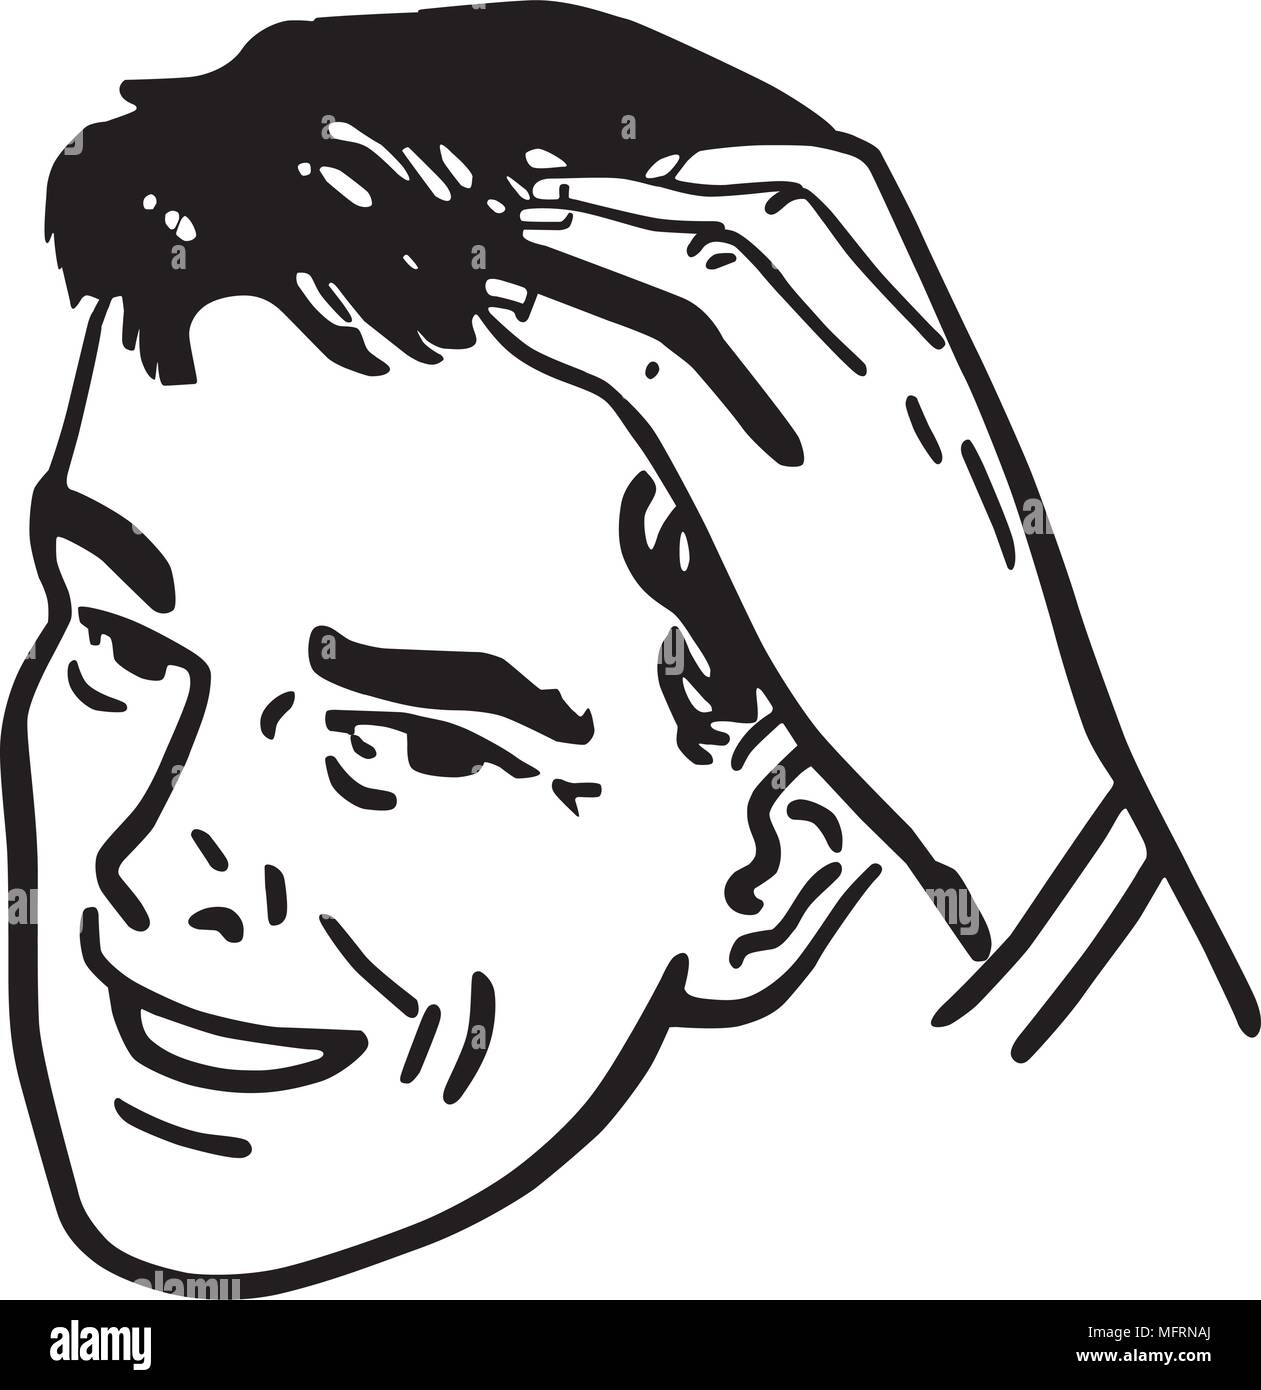 Man Scratching Head - Retro Clipart Illustration - Stock Image